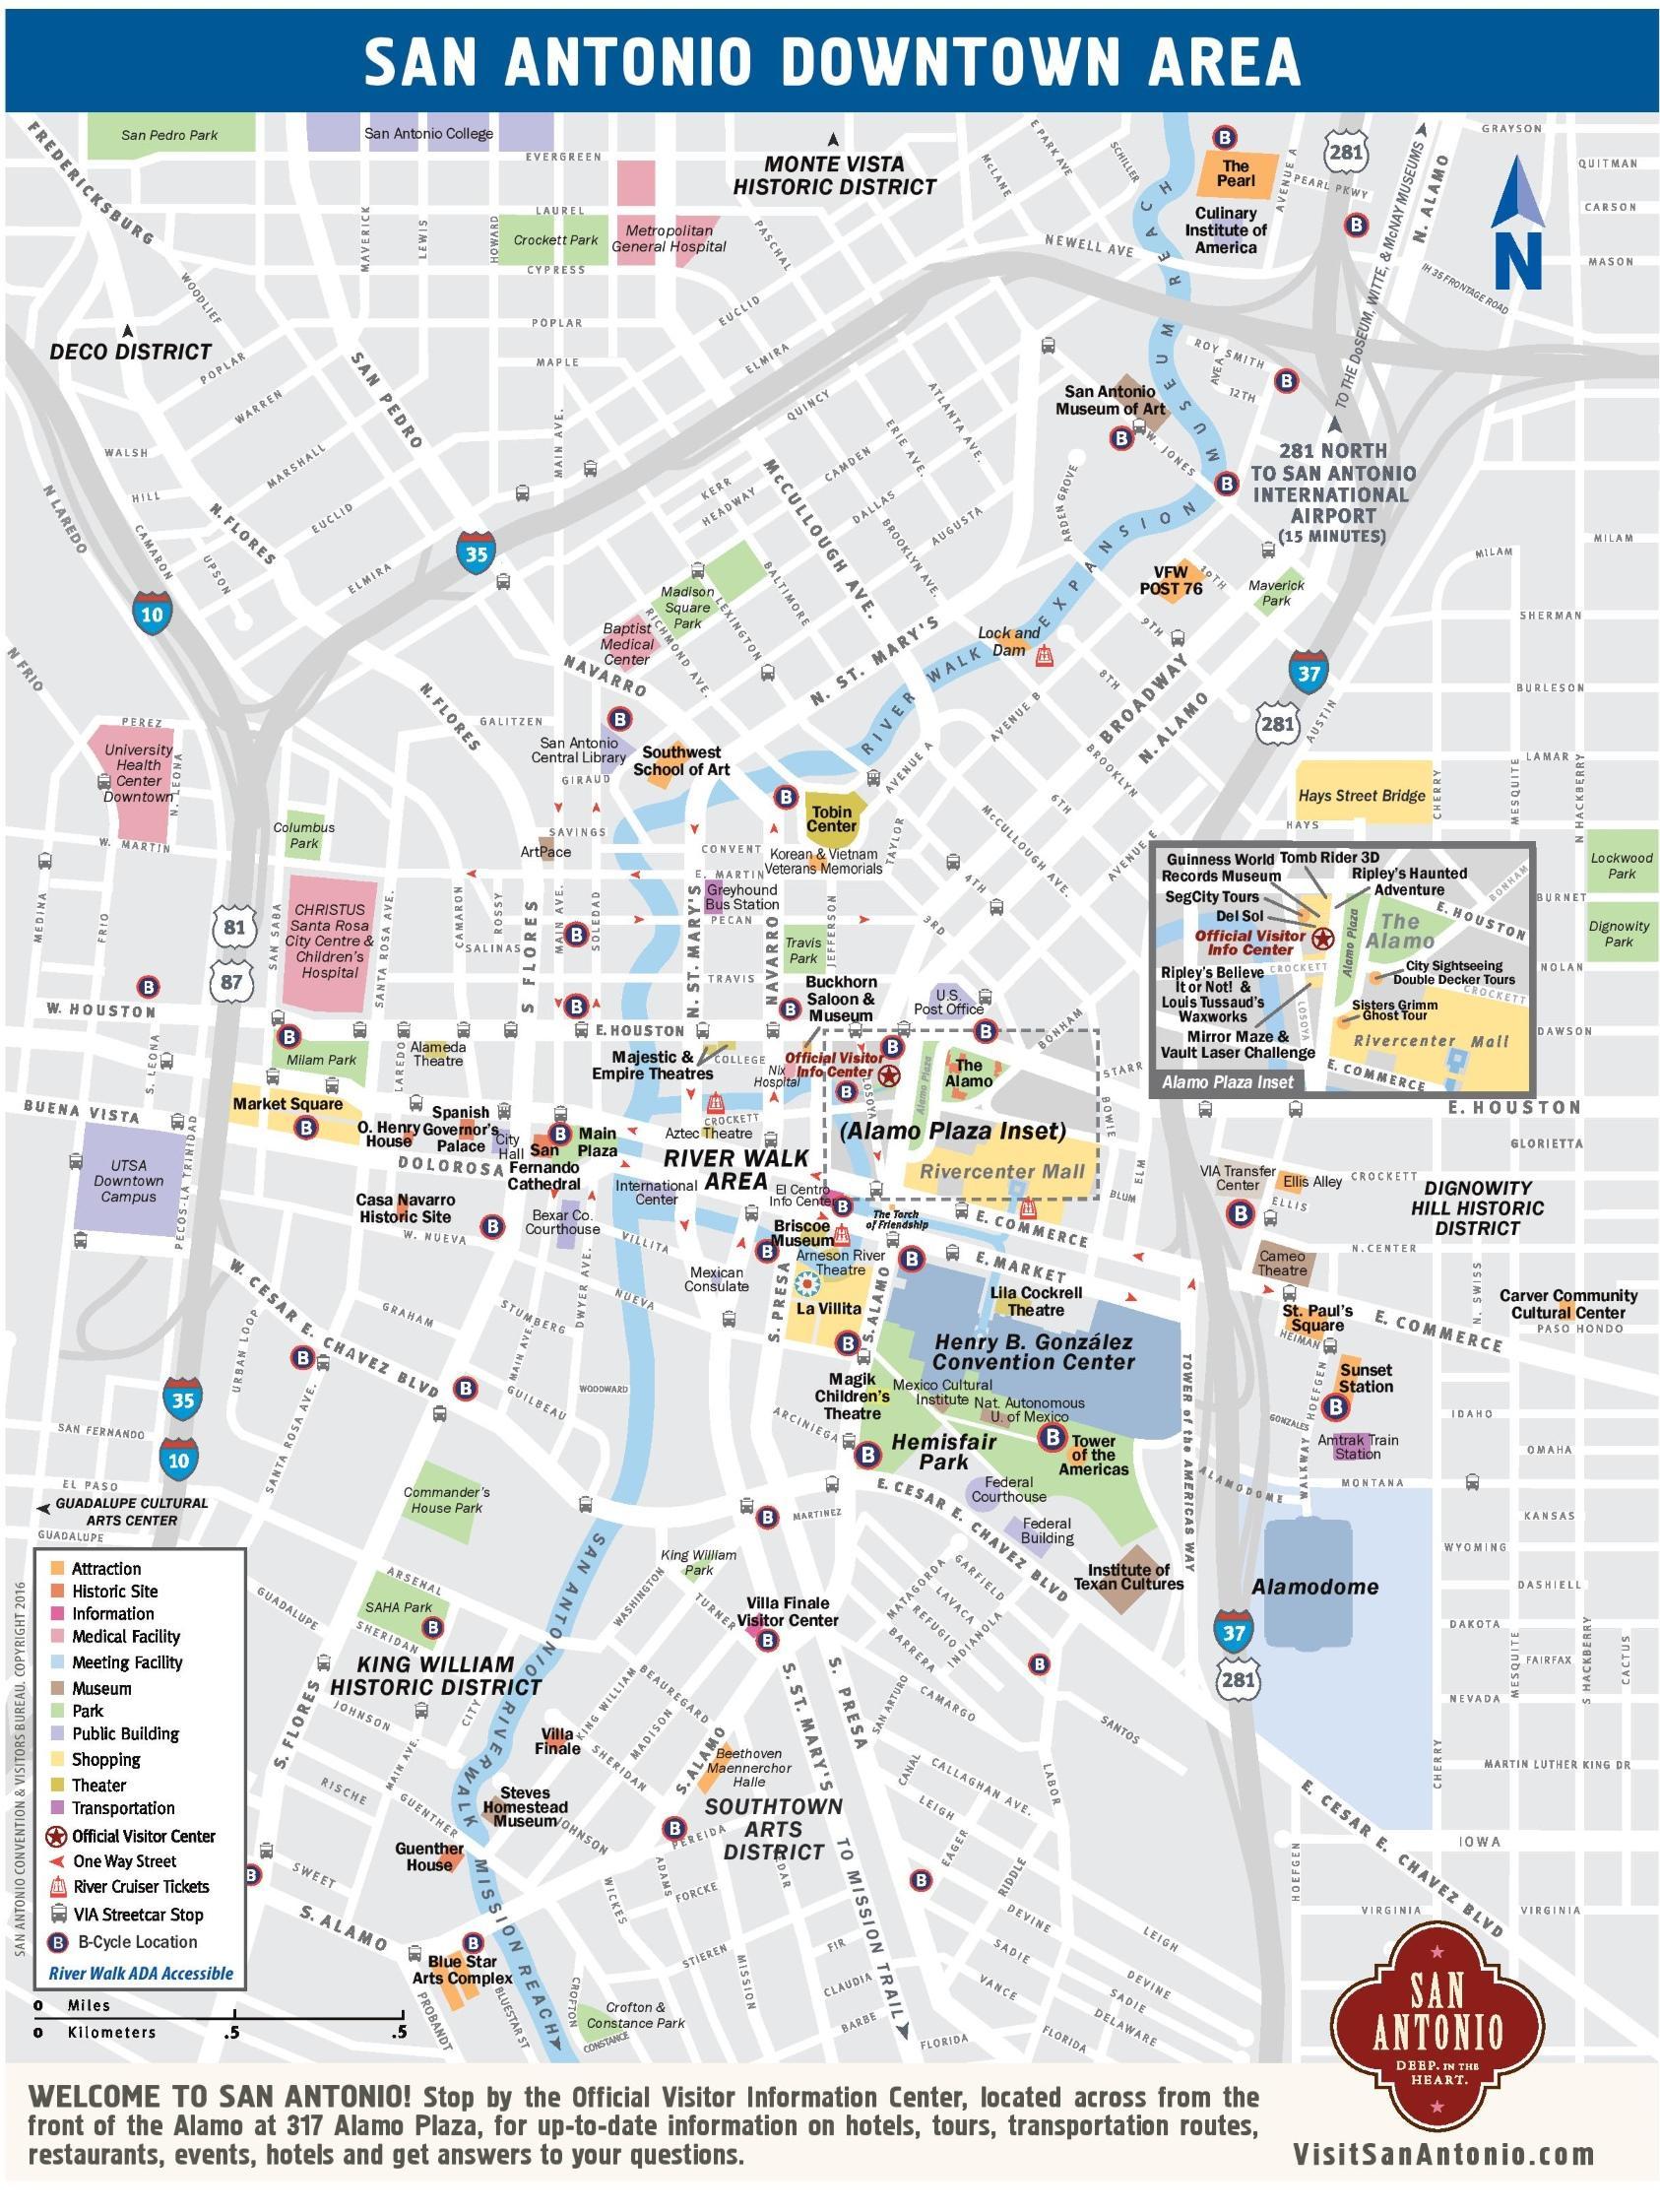 Downtown San Antonio Map - Map Of Downtown San Antonio (Texas - Usa) - Printable Map Of Downtown San Diego